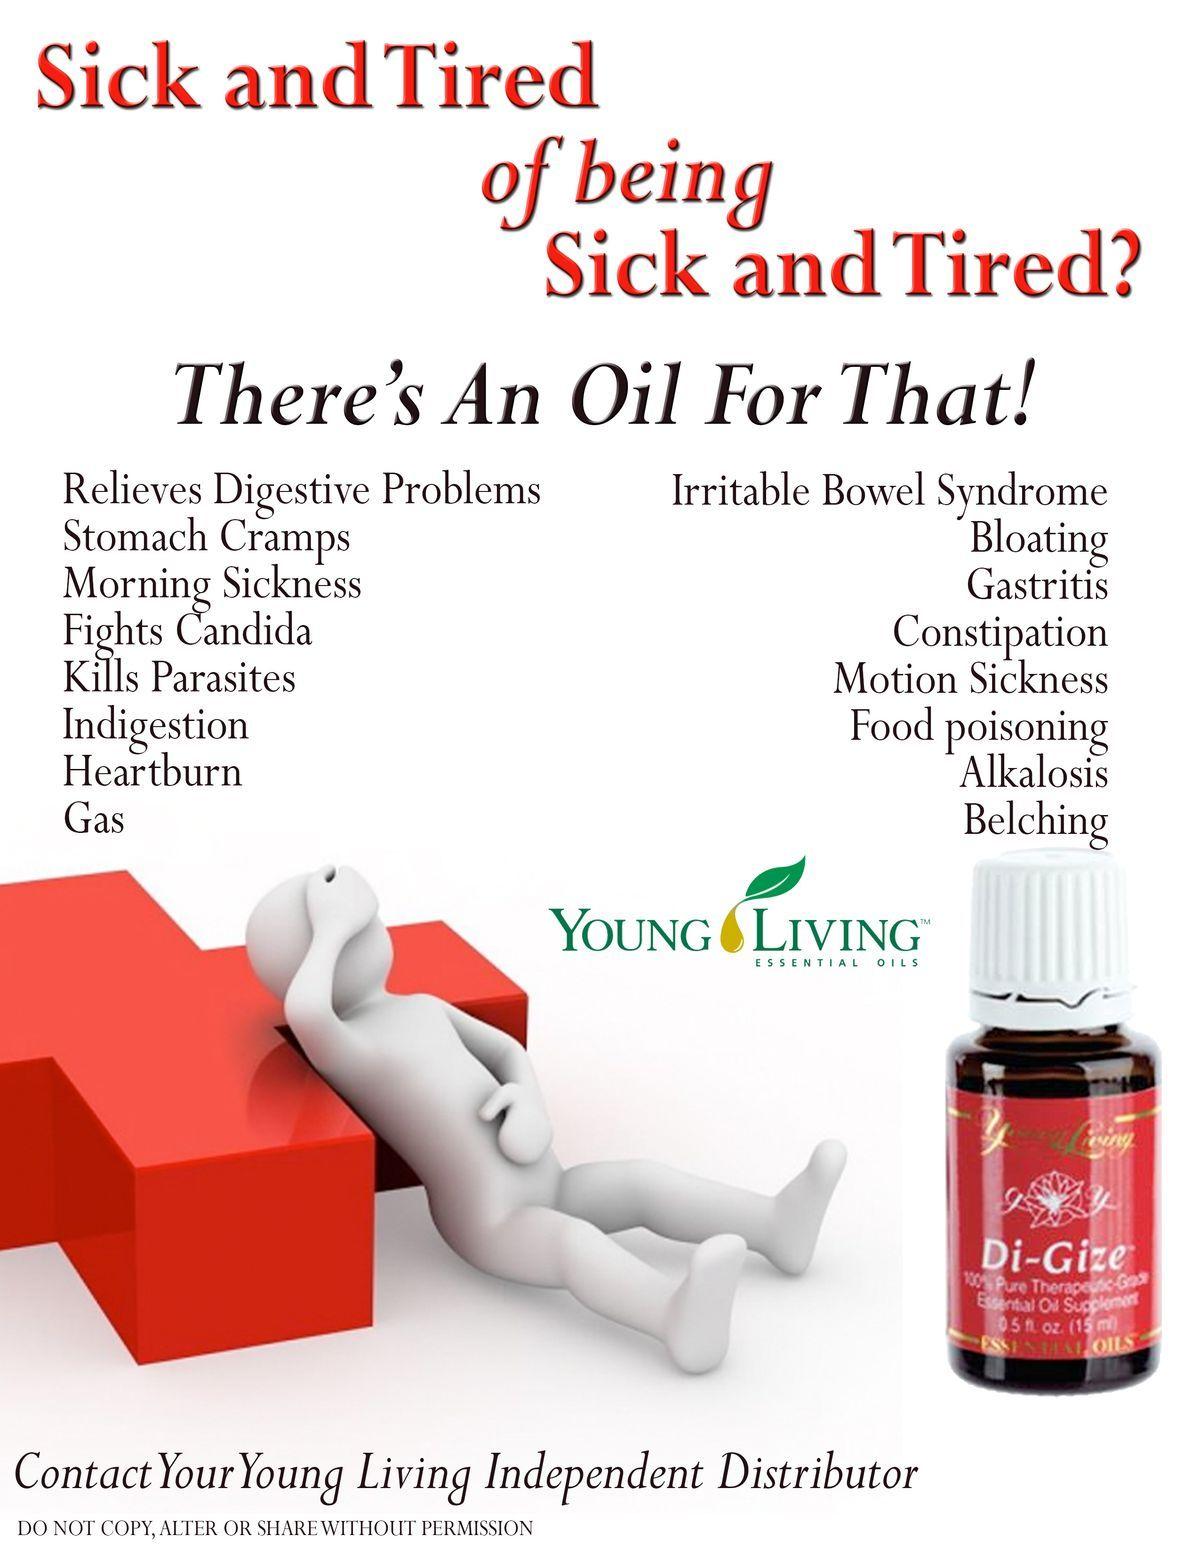 Pin on Skin care & remedies